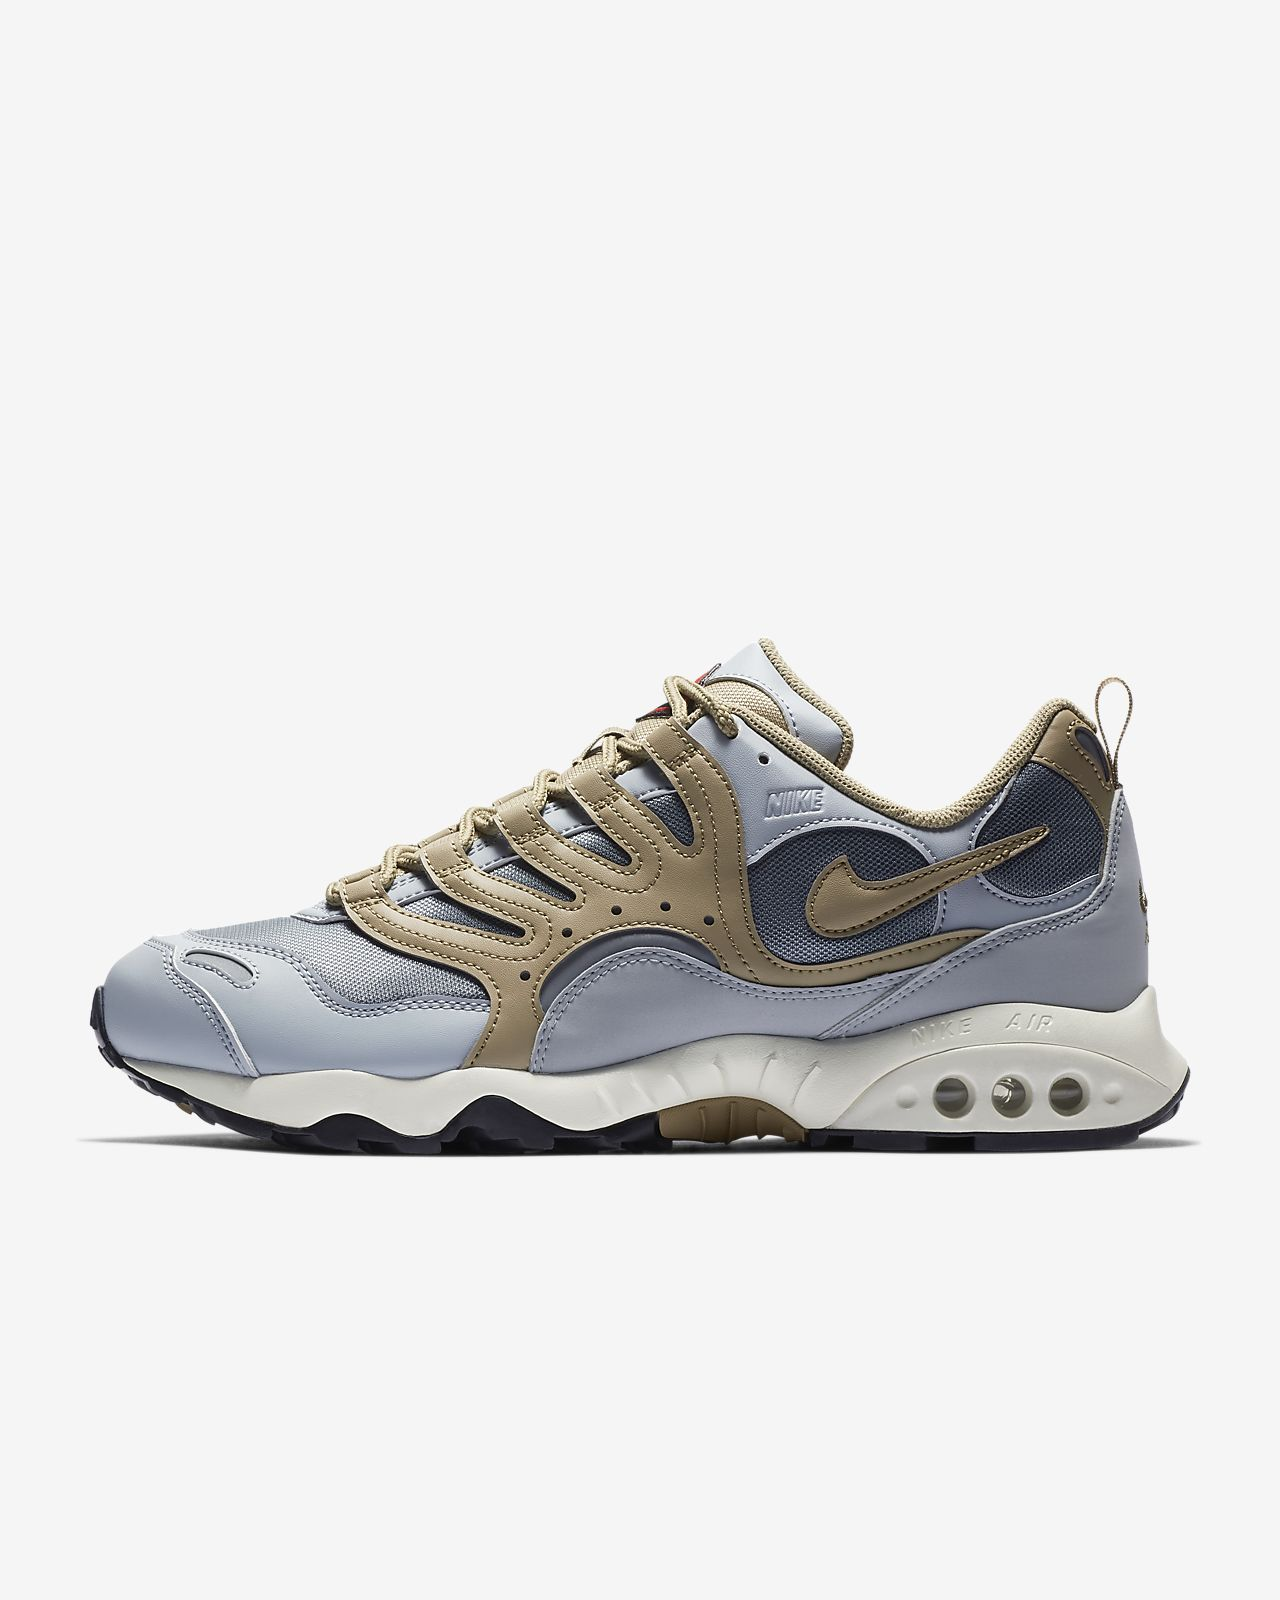 finest selection 13d60 b1e5d ... canada nike air terra humara 18 sko til herre 00419 0a678